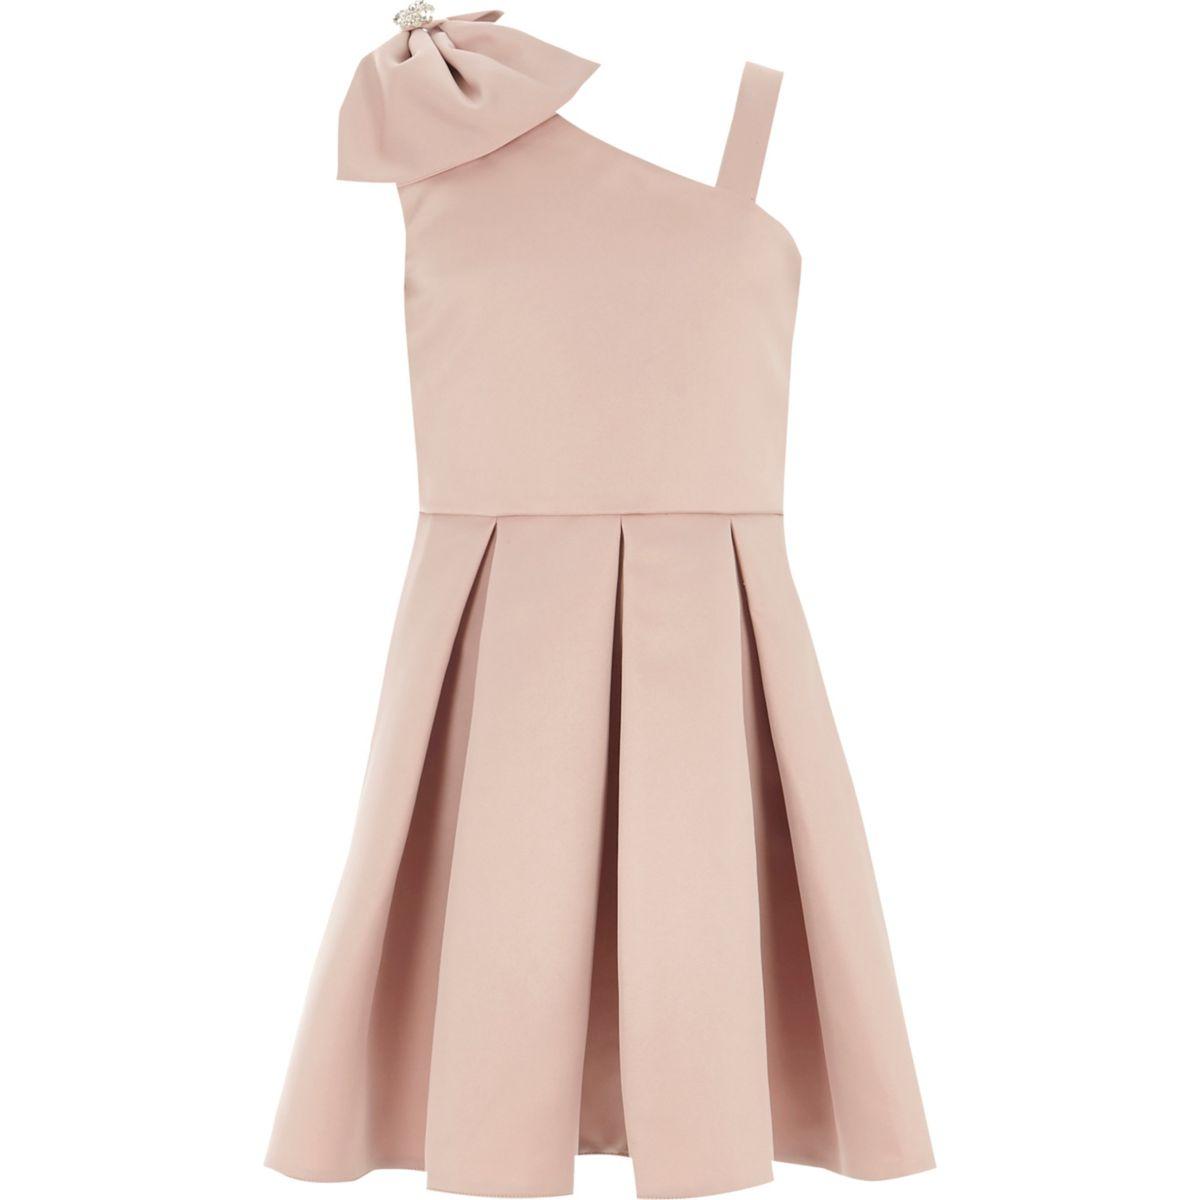 Girls pink satin bow one shoulder prom dress